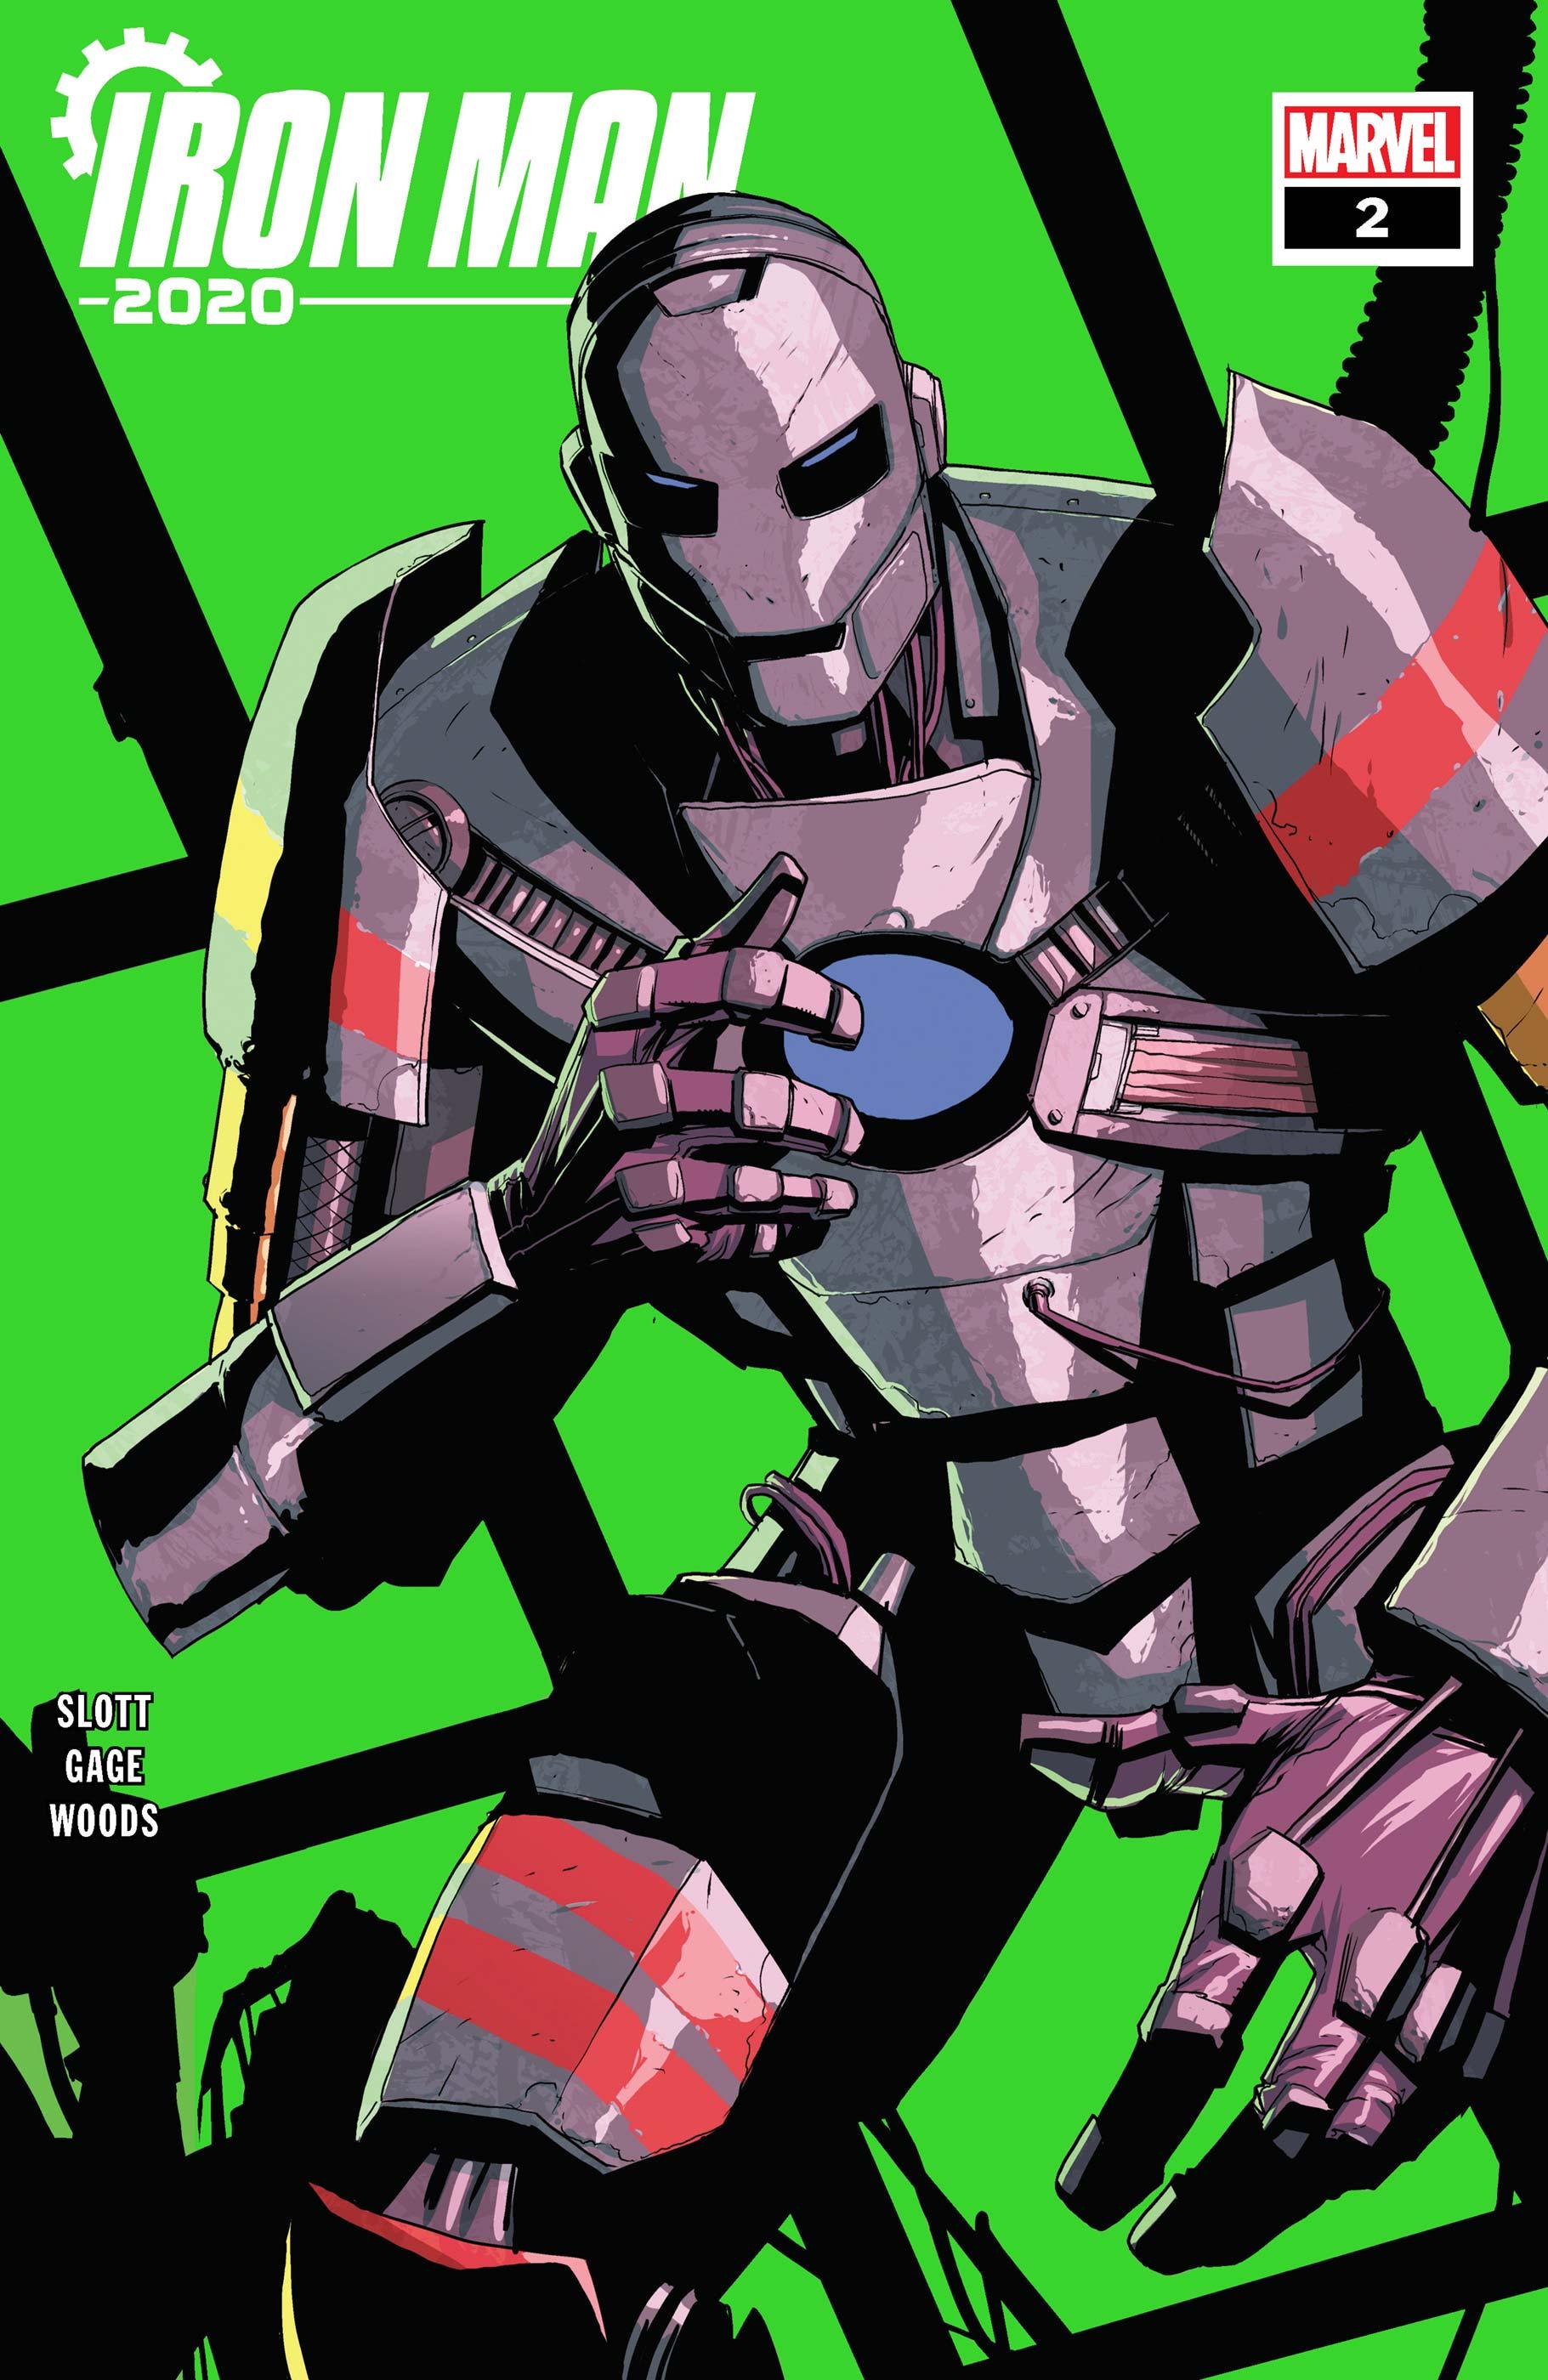 Iron Man 2020 (2020) #2